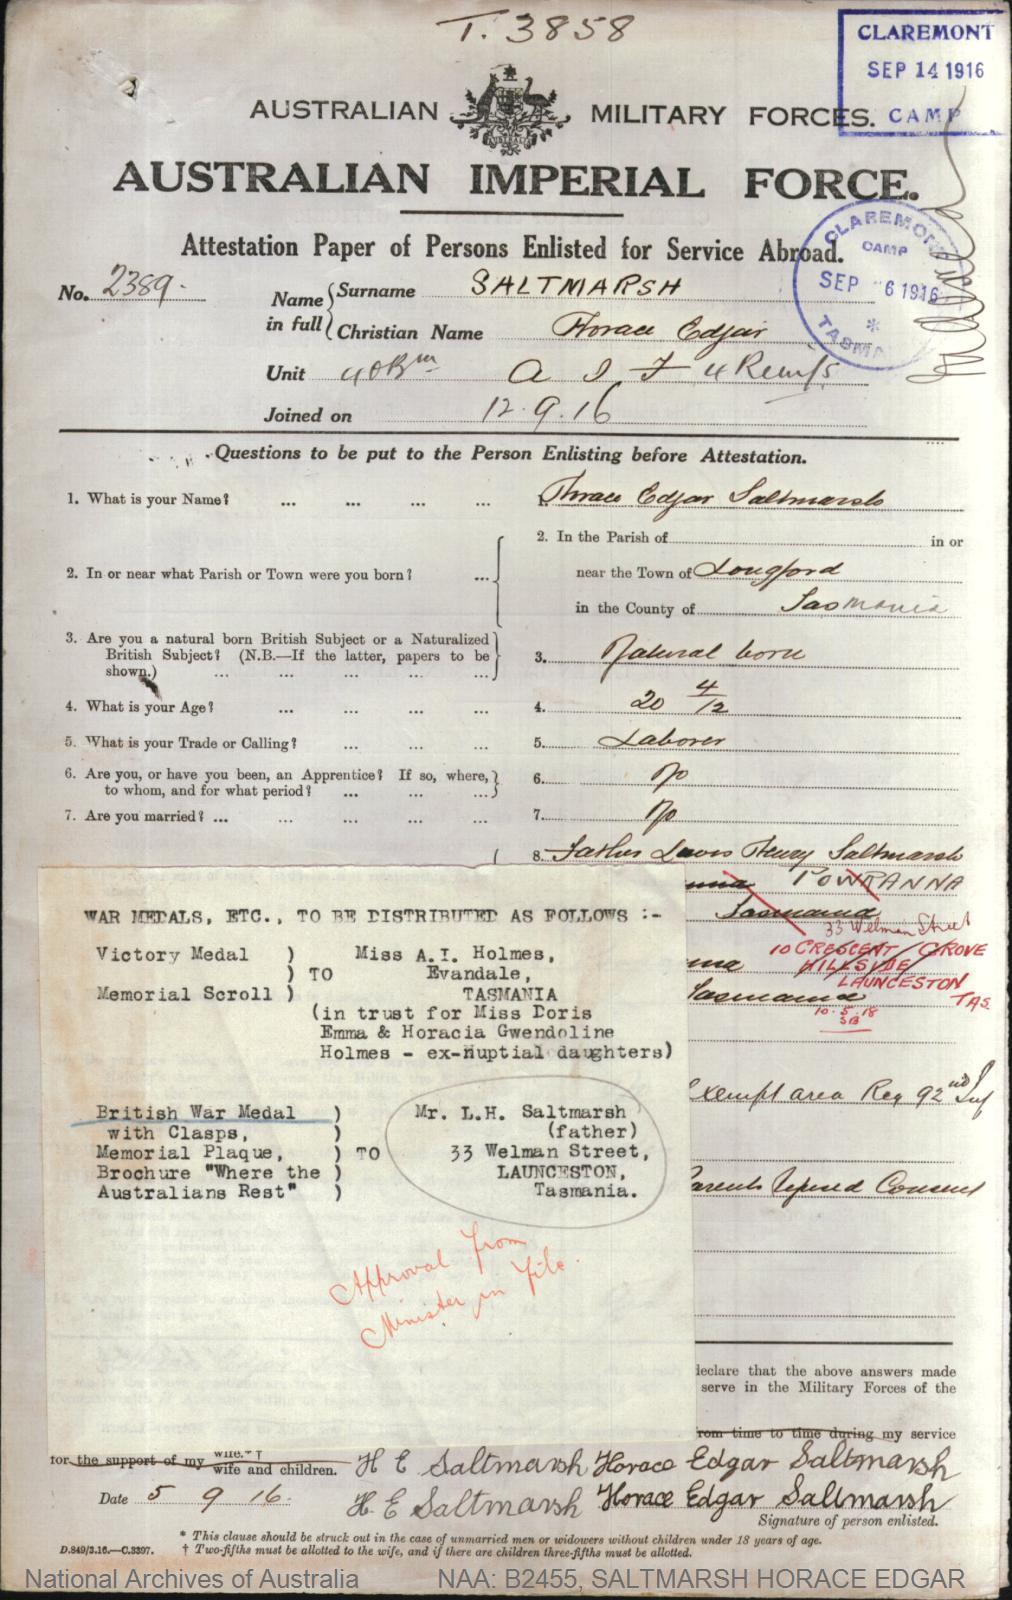 SALTMARSH Horace Edgar : Service Number - 2389 : Place of Birth - Longford TAS : Place of Enlistment - Claremont TAS : Next of Kin - (Father) SALTMARSH Lewis Henry